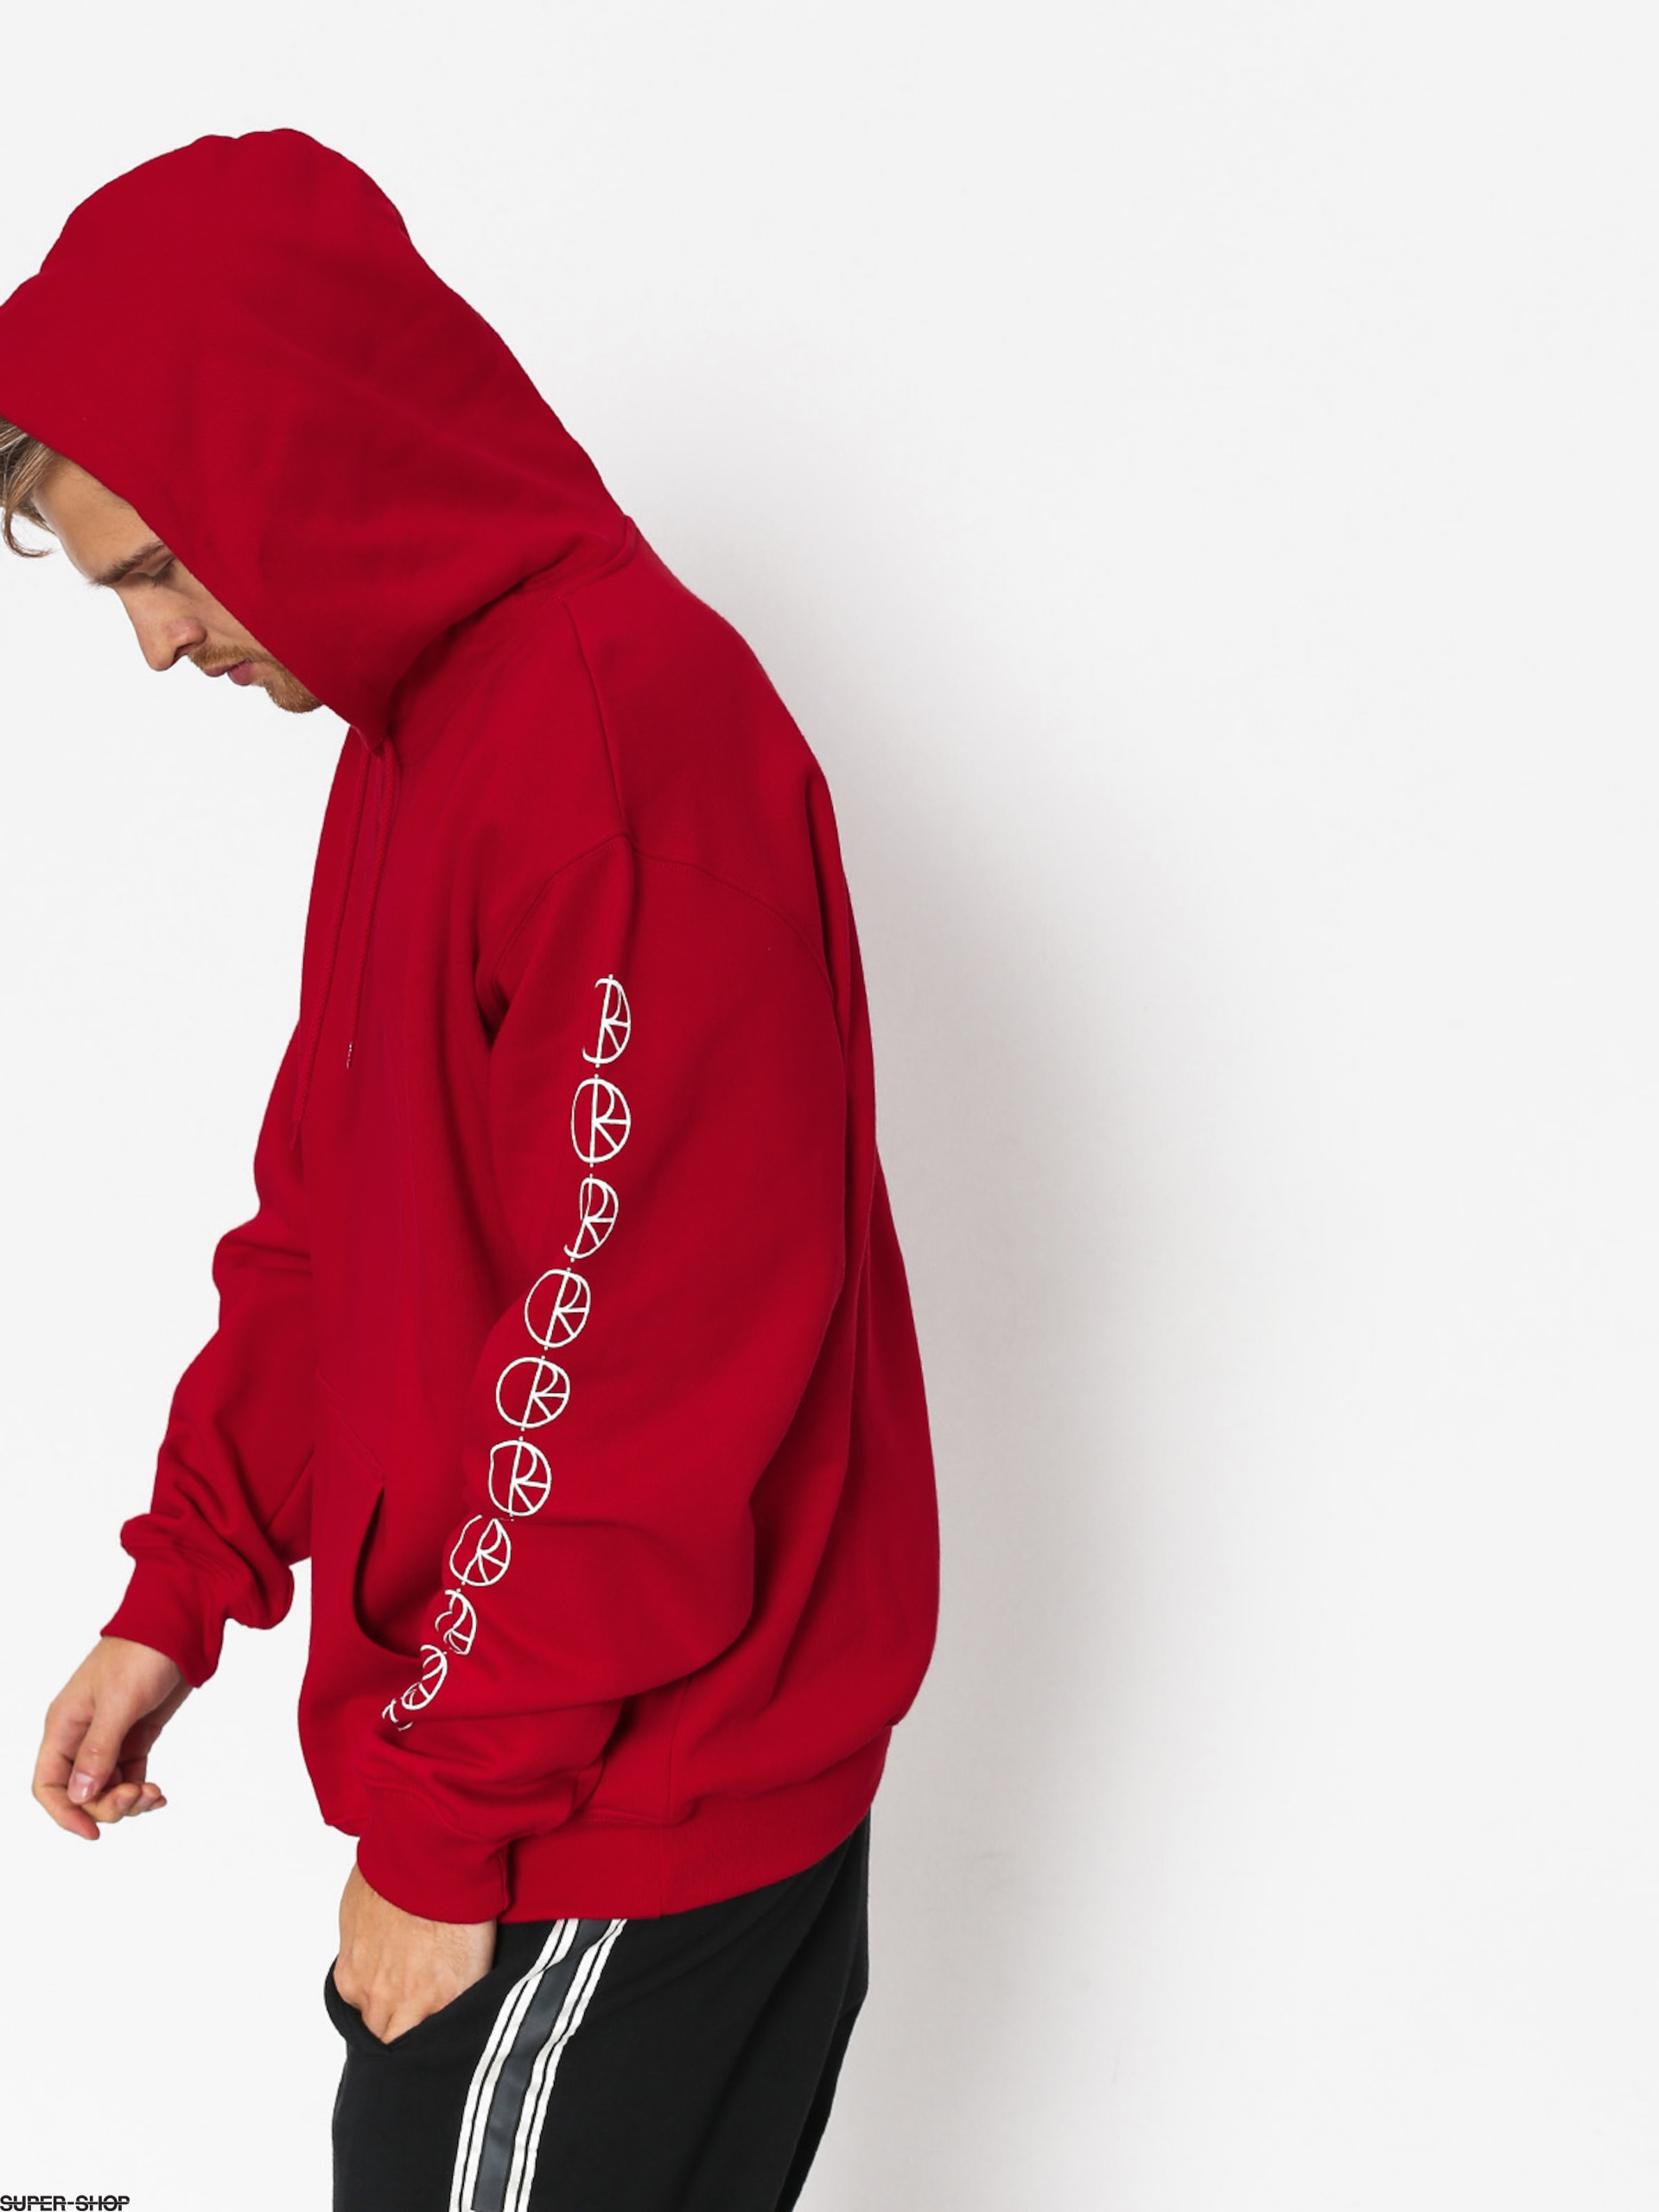 981783-w1920-polar-skate-hoodie-racing-hd-red.jpg e0e369813e